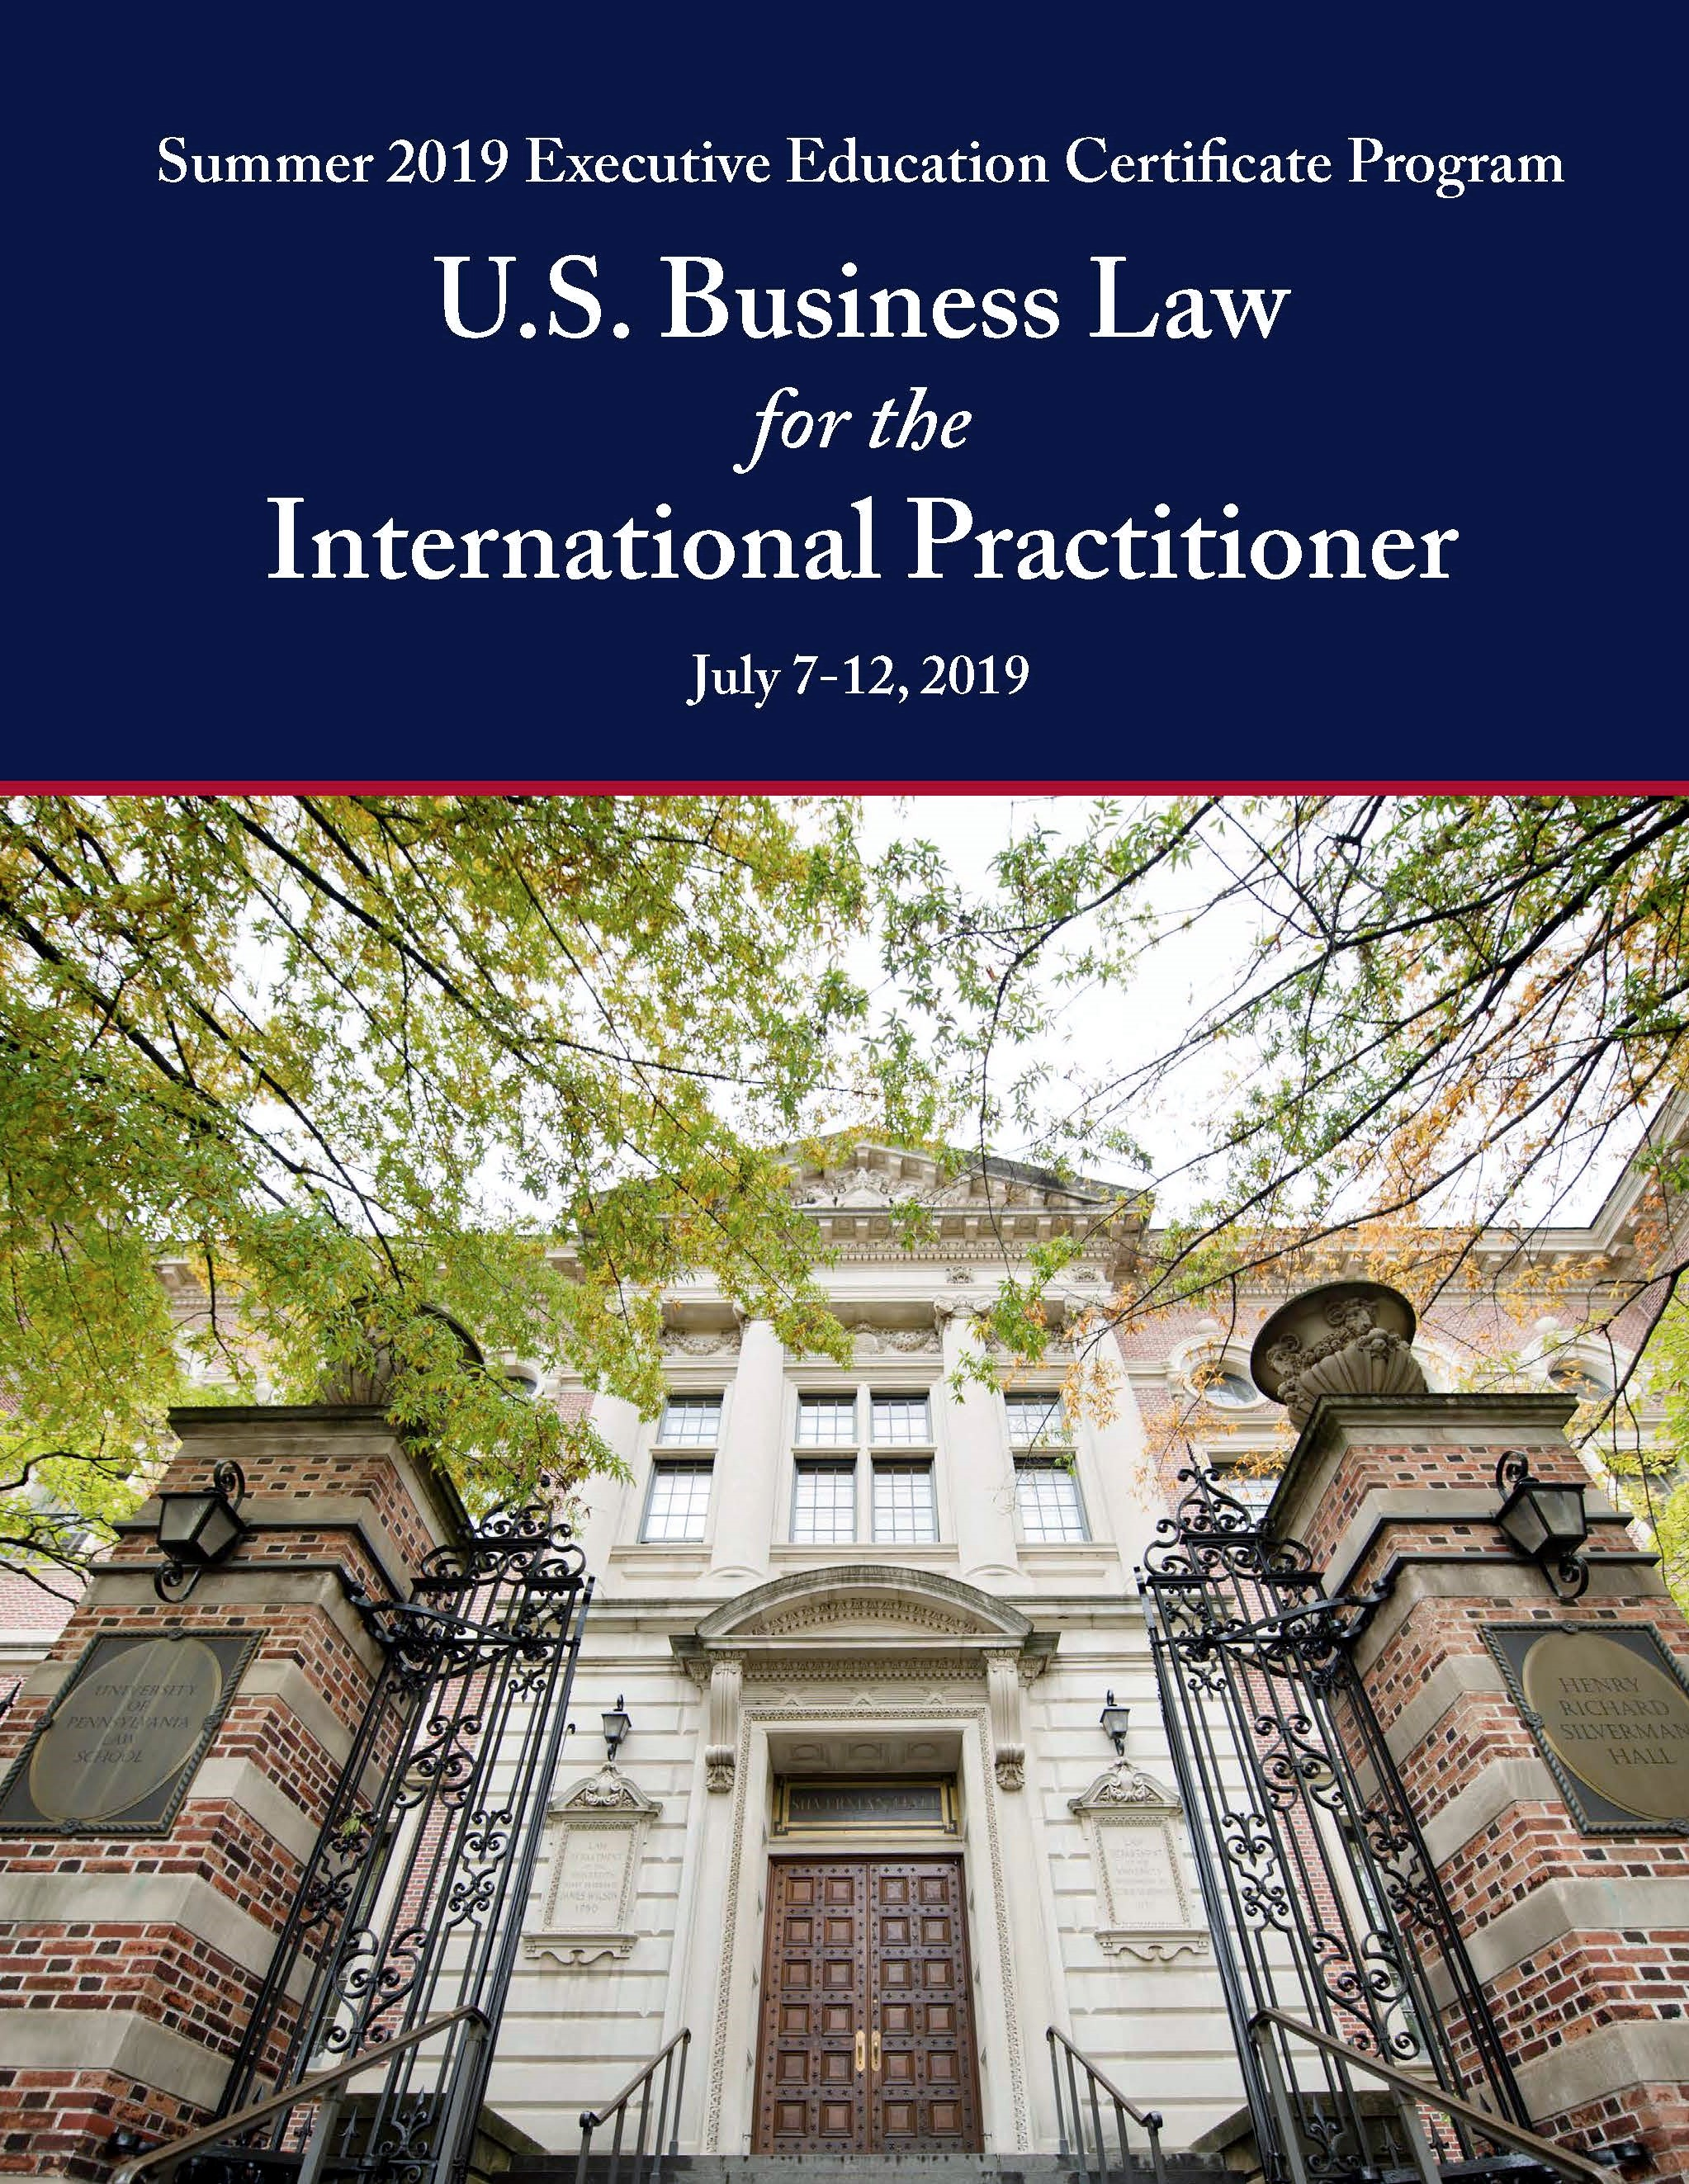 US Business Law flyer 8.5x11 Dec 2018_Page_1.2